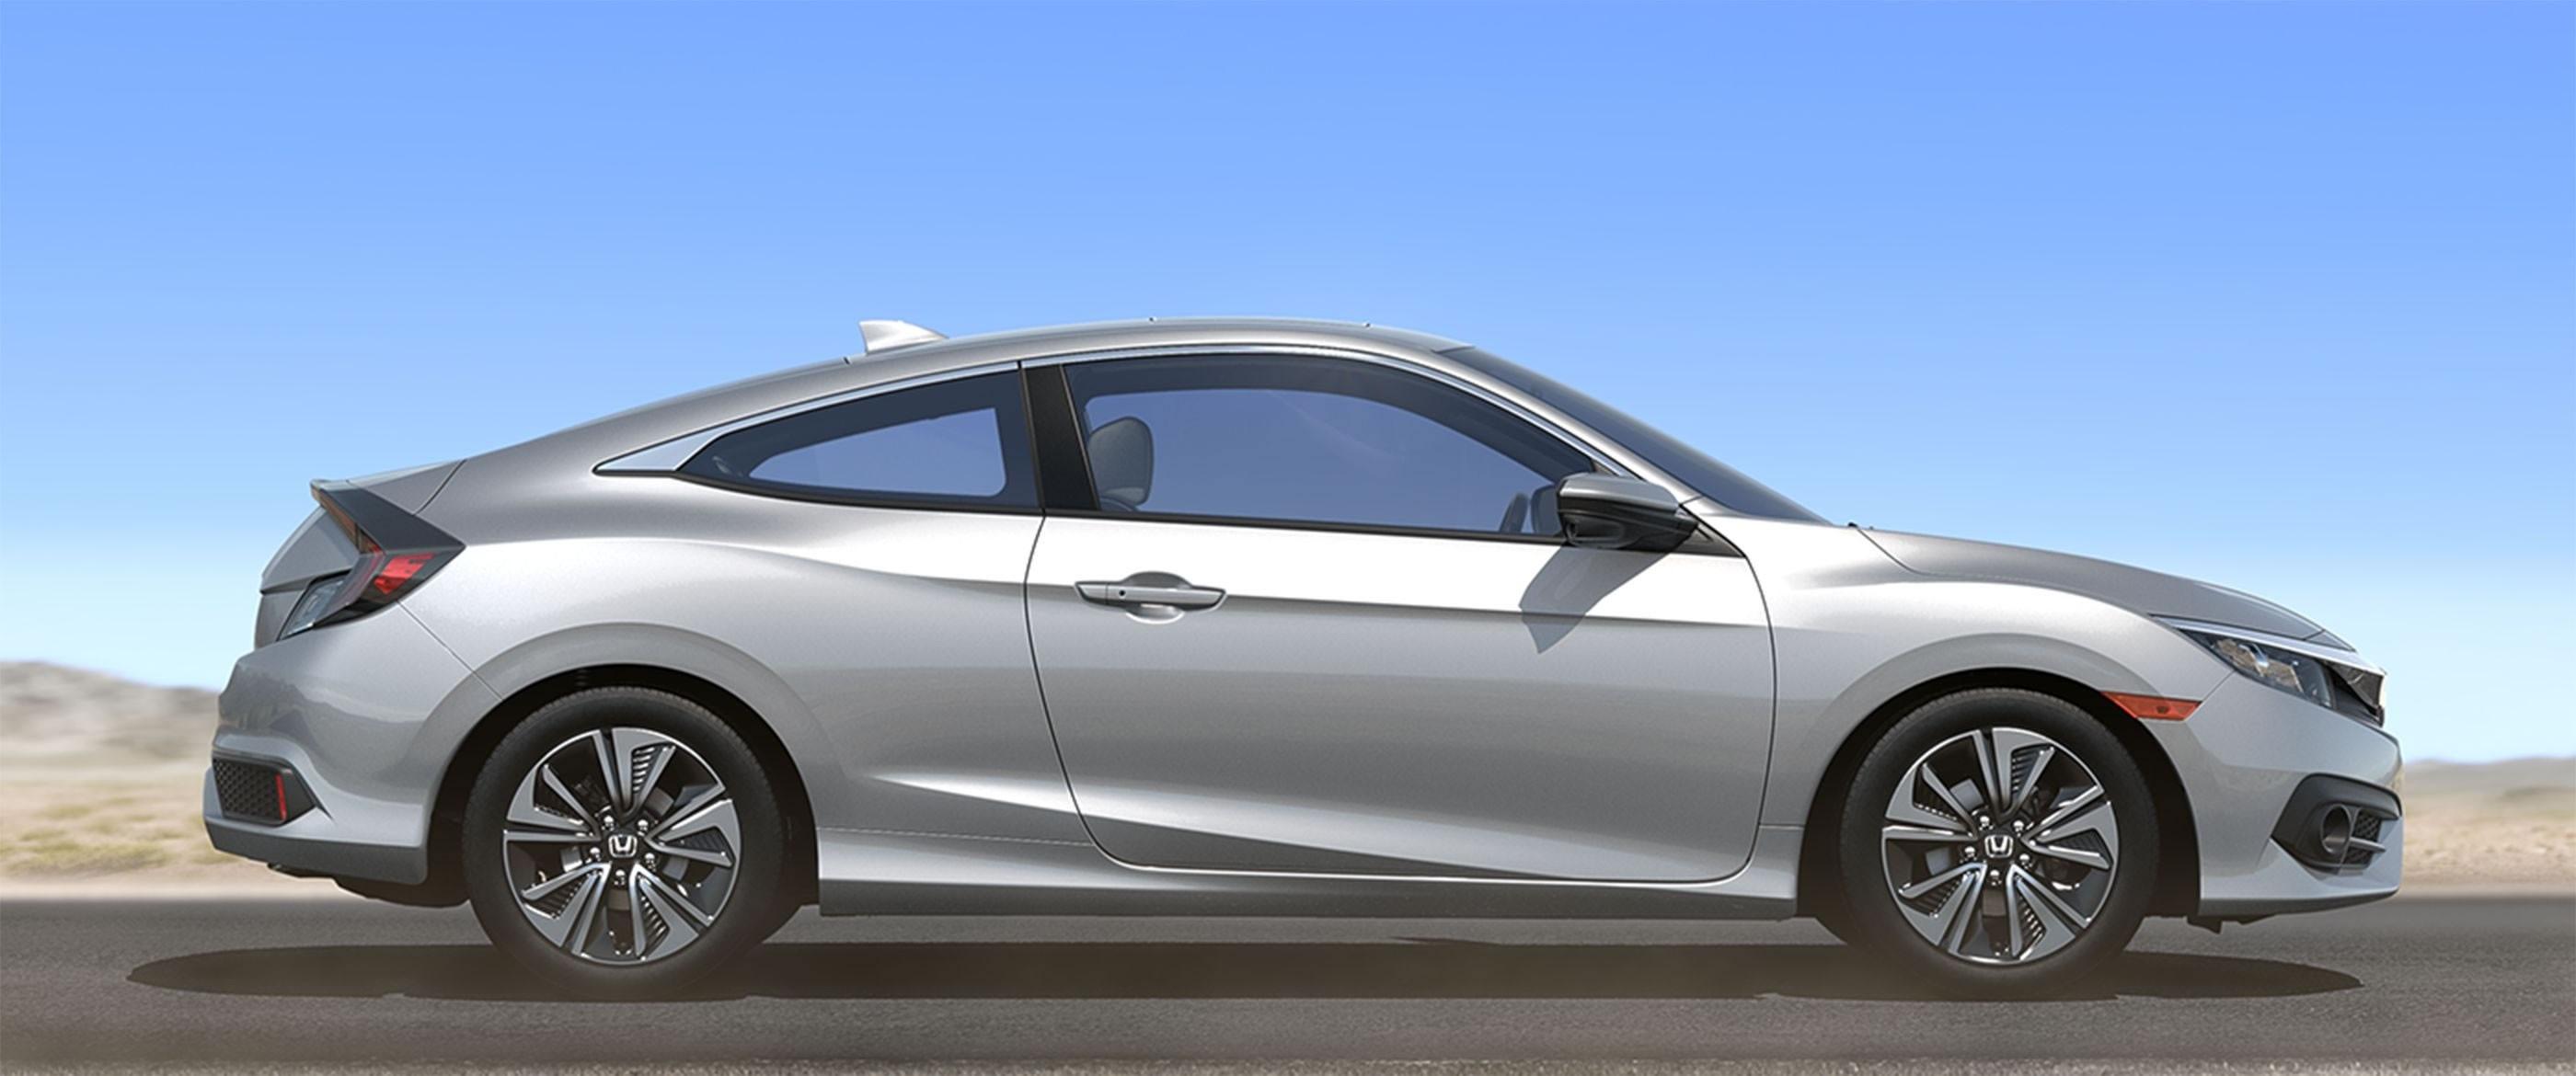 Honda Coupe 2017 >> 2017 Honda Civic Coupe Honda World Downey Downey Ca